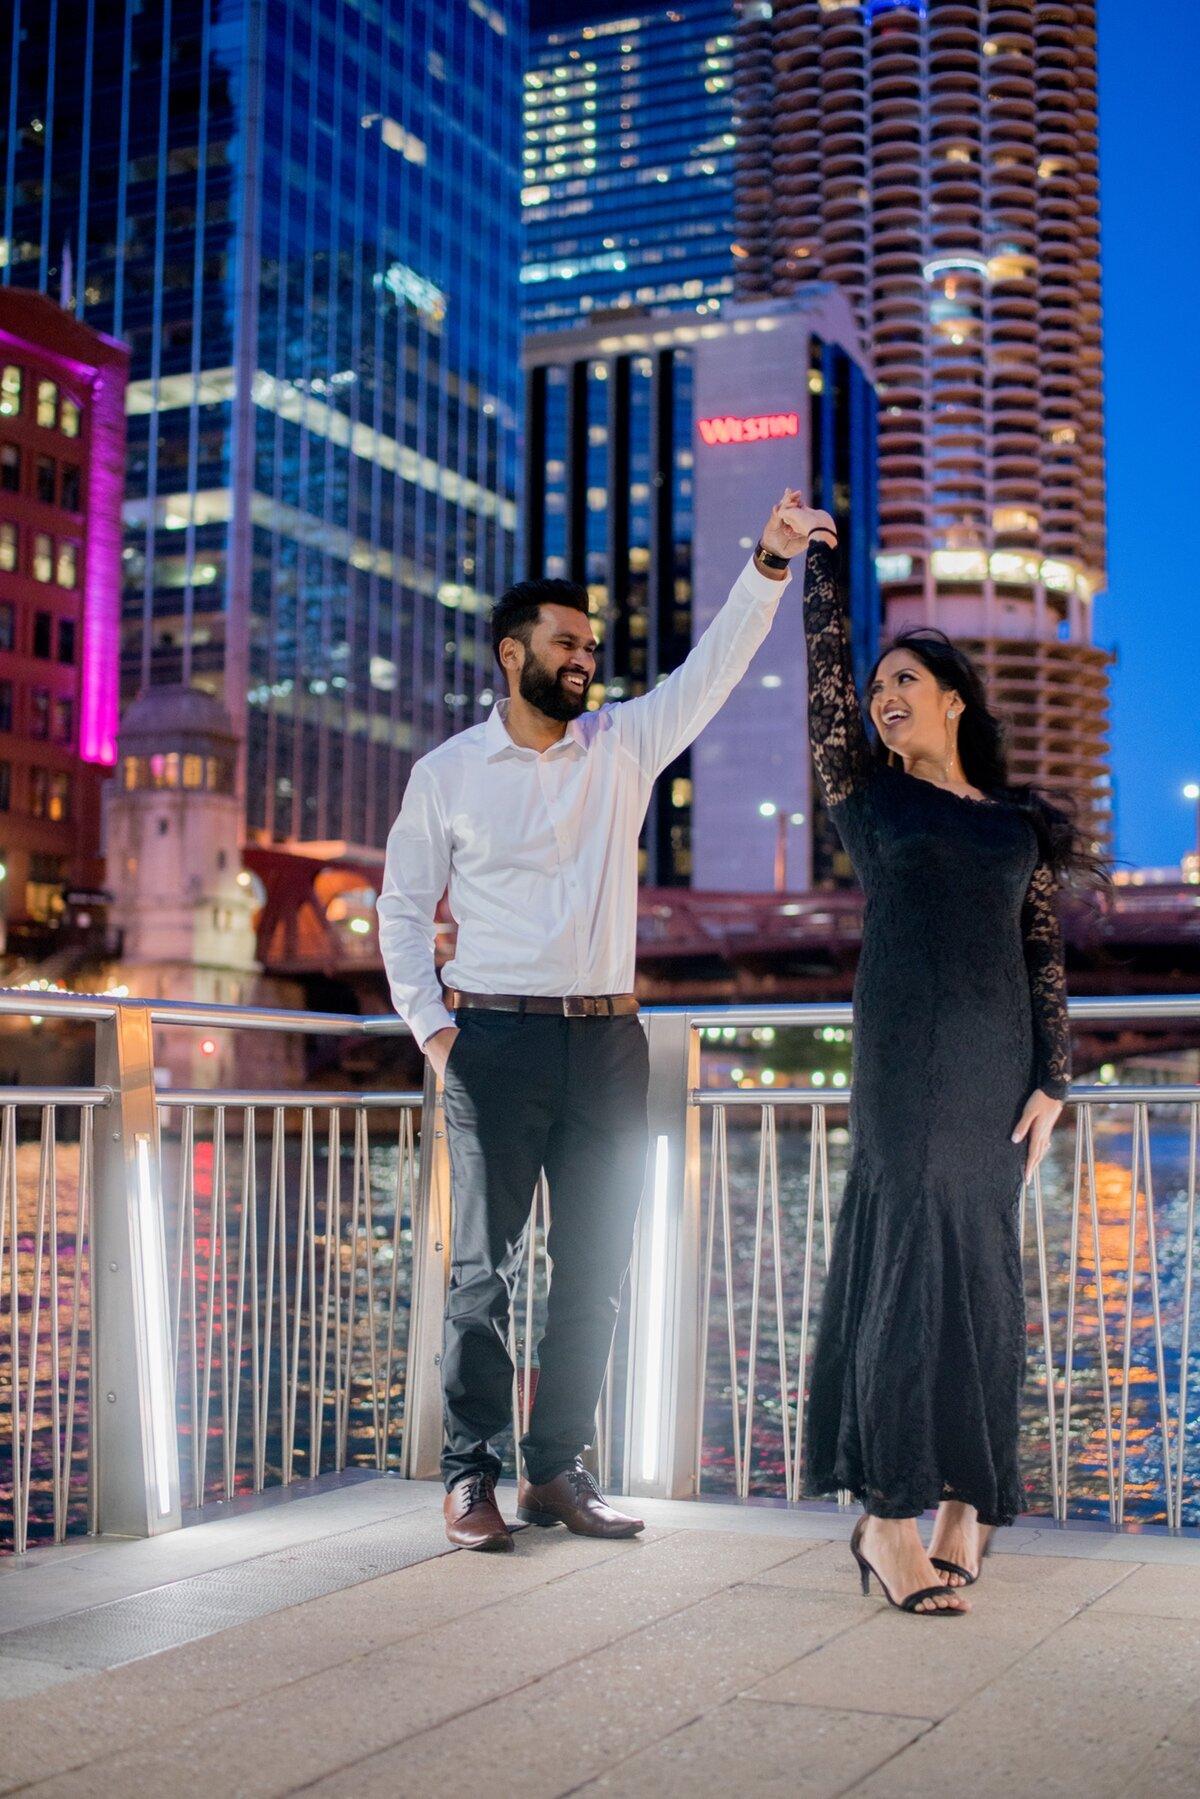 Le Cape Weddings - Chicago Engagement Session - Joann and Bensen -38.jpg